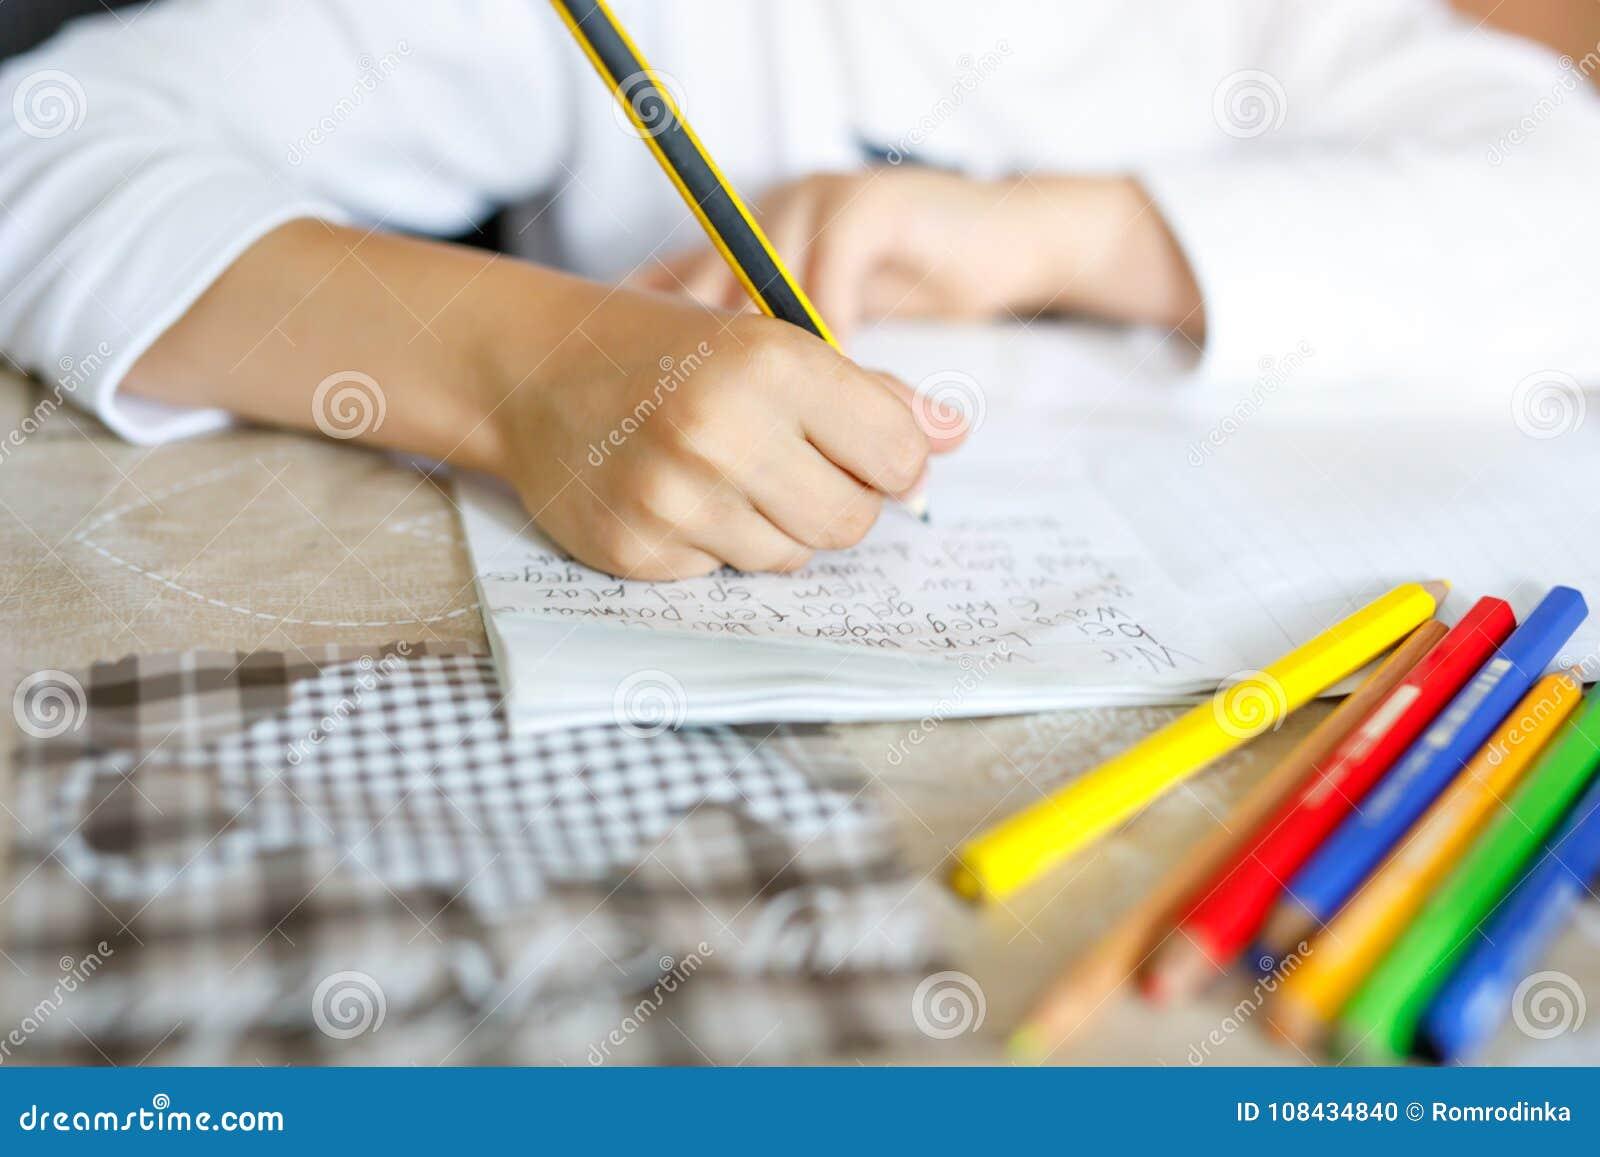 Homework help writing story